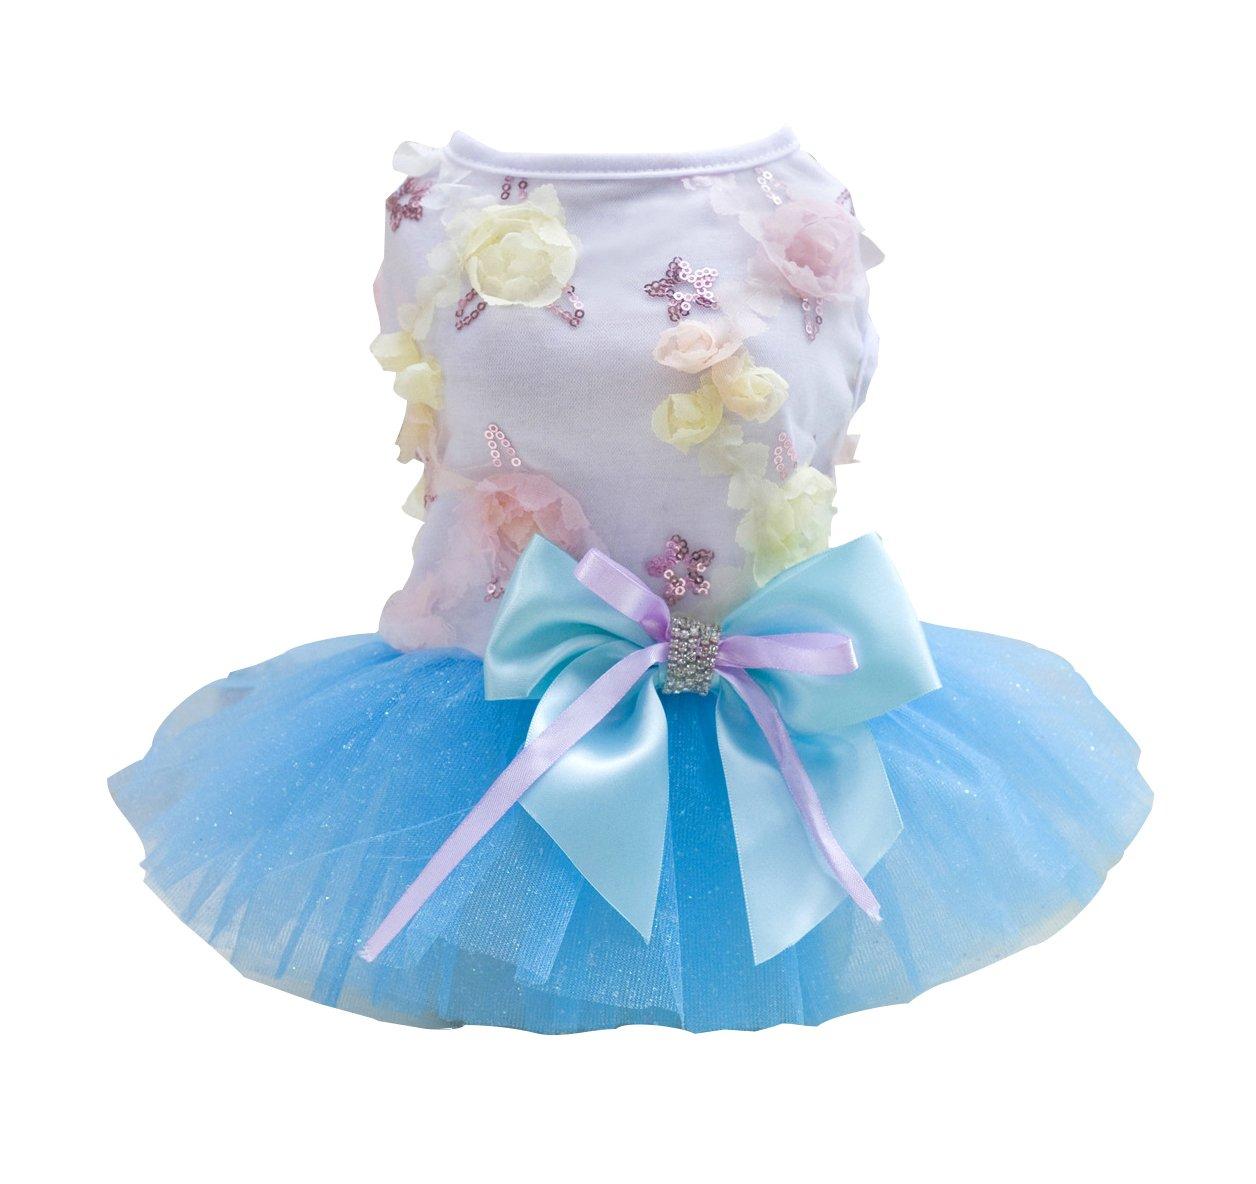 blueE XL blueE XL Rdc Pet Dog Dress Puppy Dog Princess Dresses,Tutu Flower and Sequin Dot Wedding Lace Dress Luxury Bow Dress for Small Dog Girl (XL, bluee)